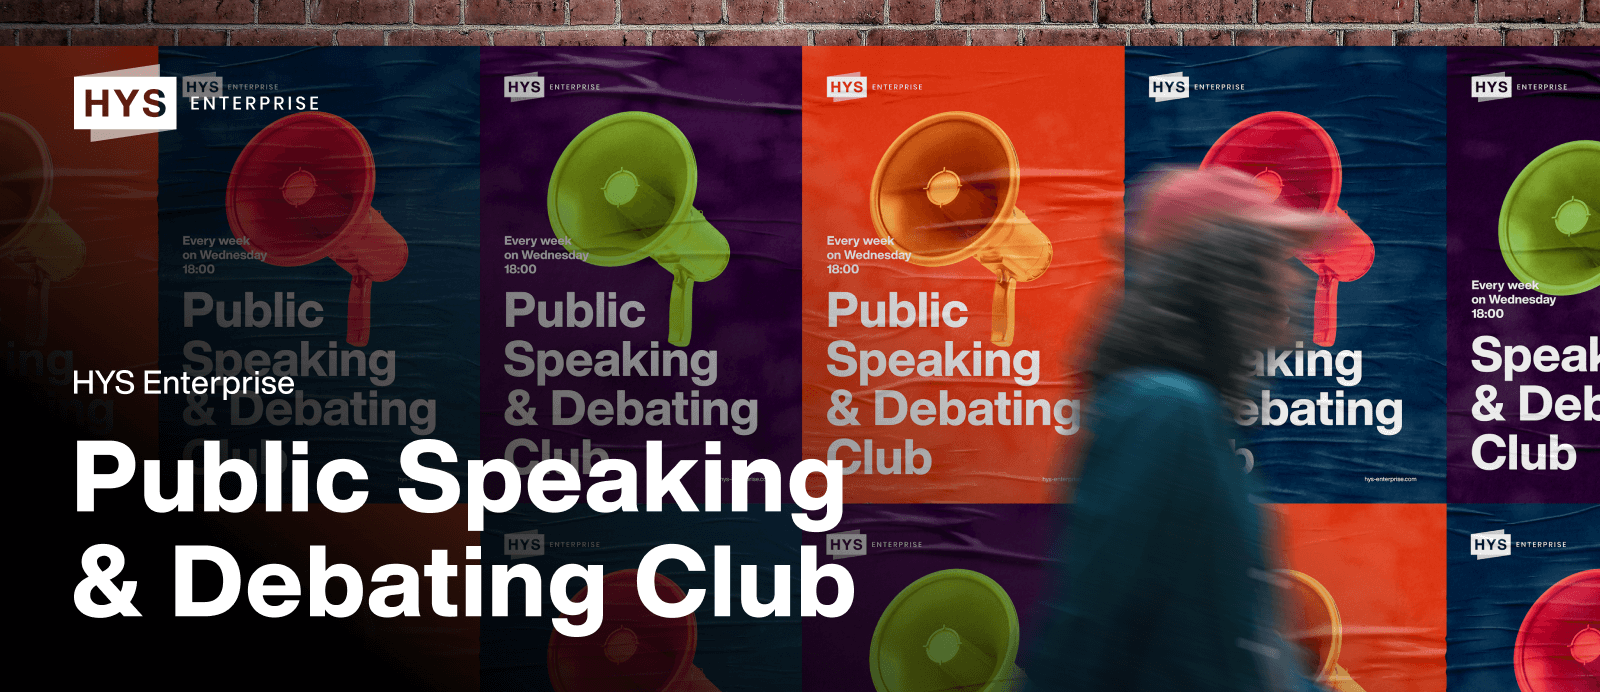 Public Speaking & Debating Club